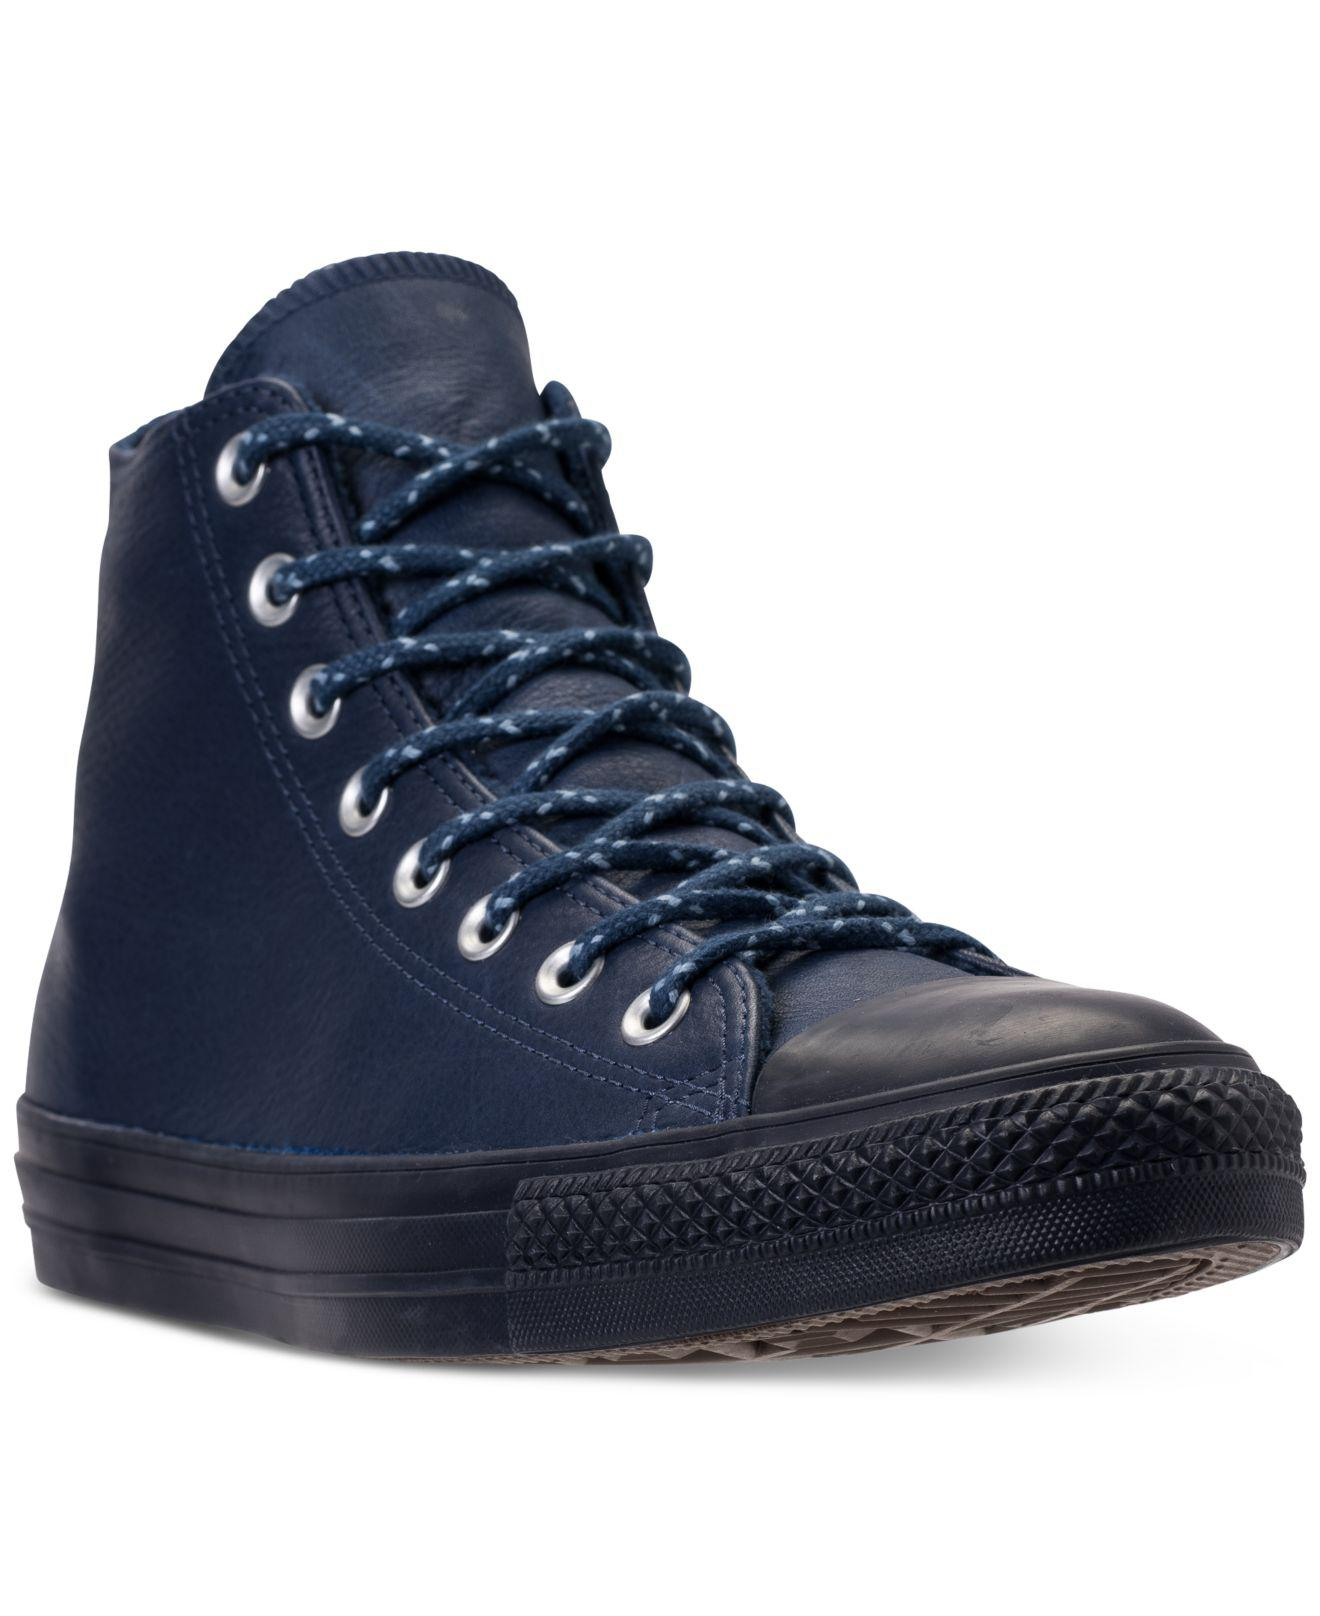 420bb0f4ebdd Lyst - Converse Chuck Taylor All Star Leather High Top Casual ...